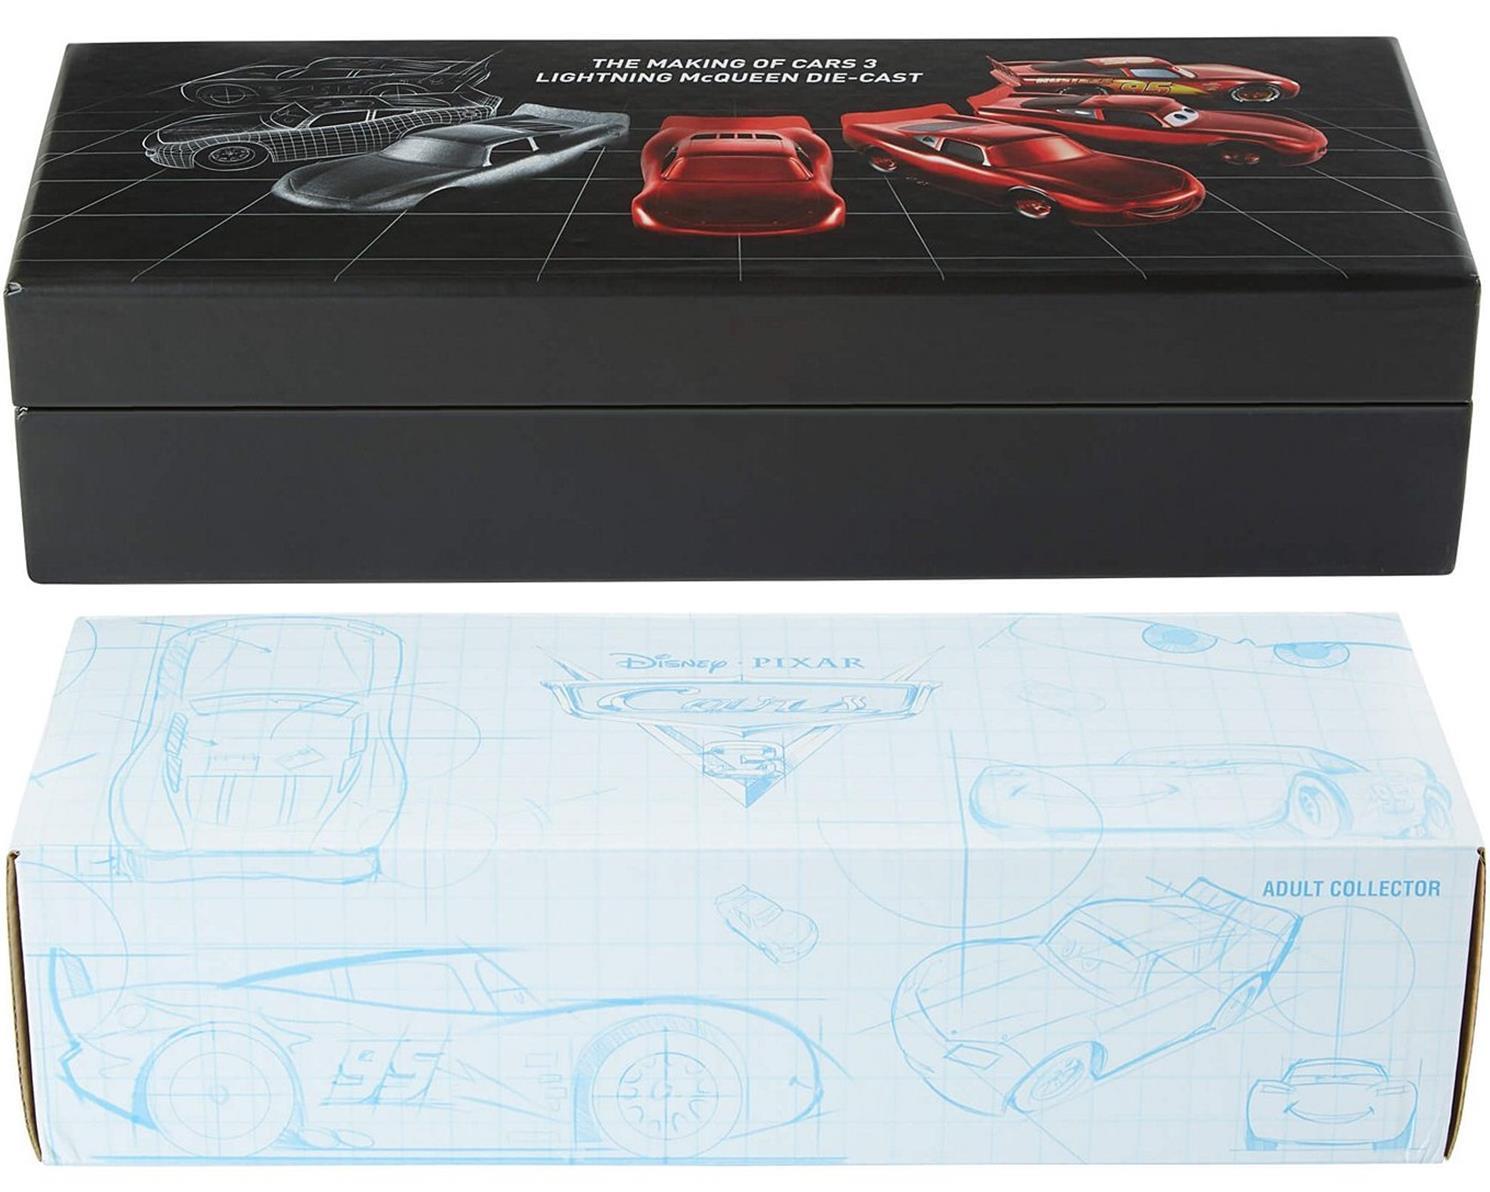 Cars-3-sdcc-lightning-mcqueen-box